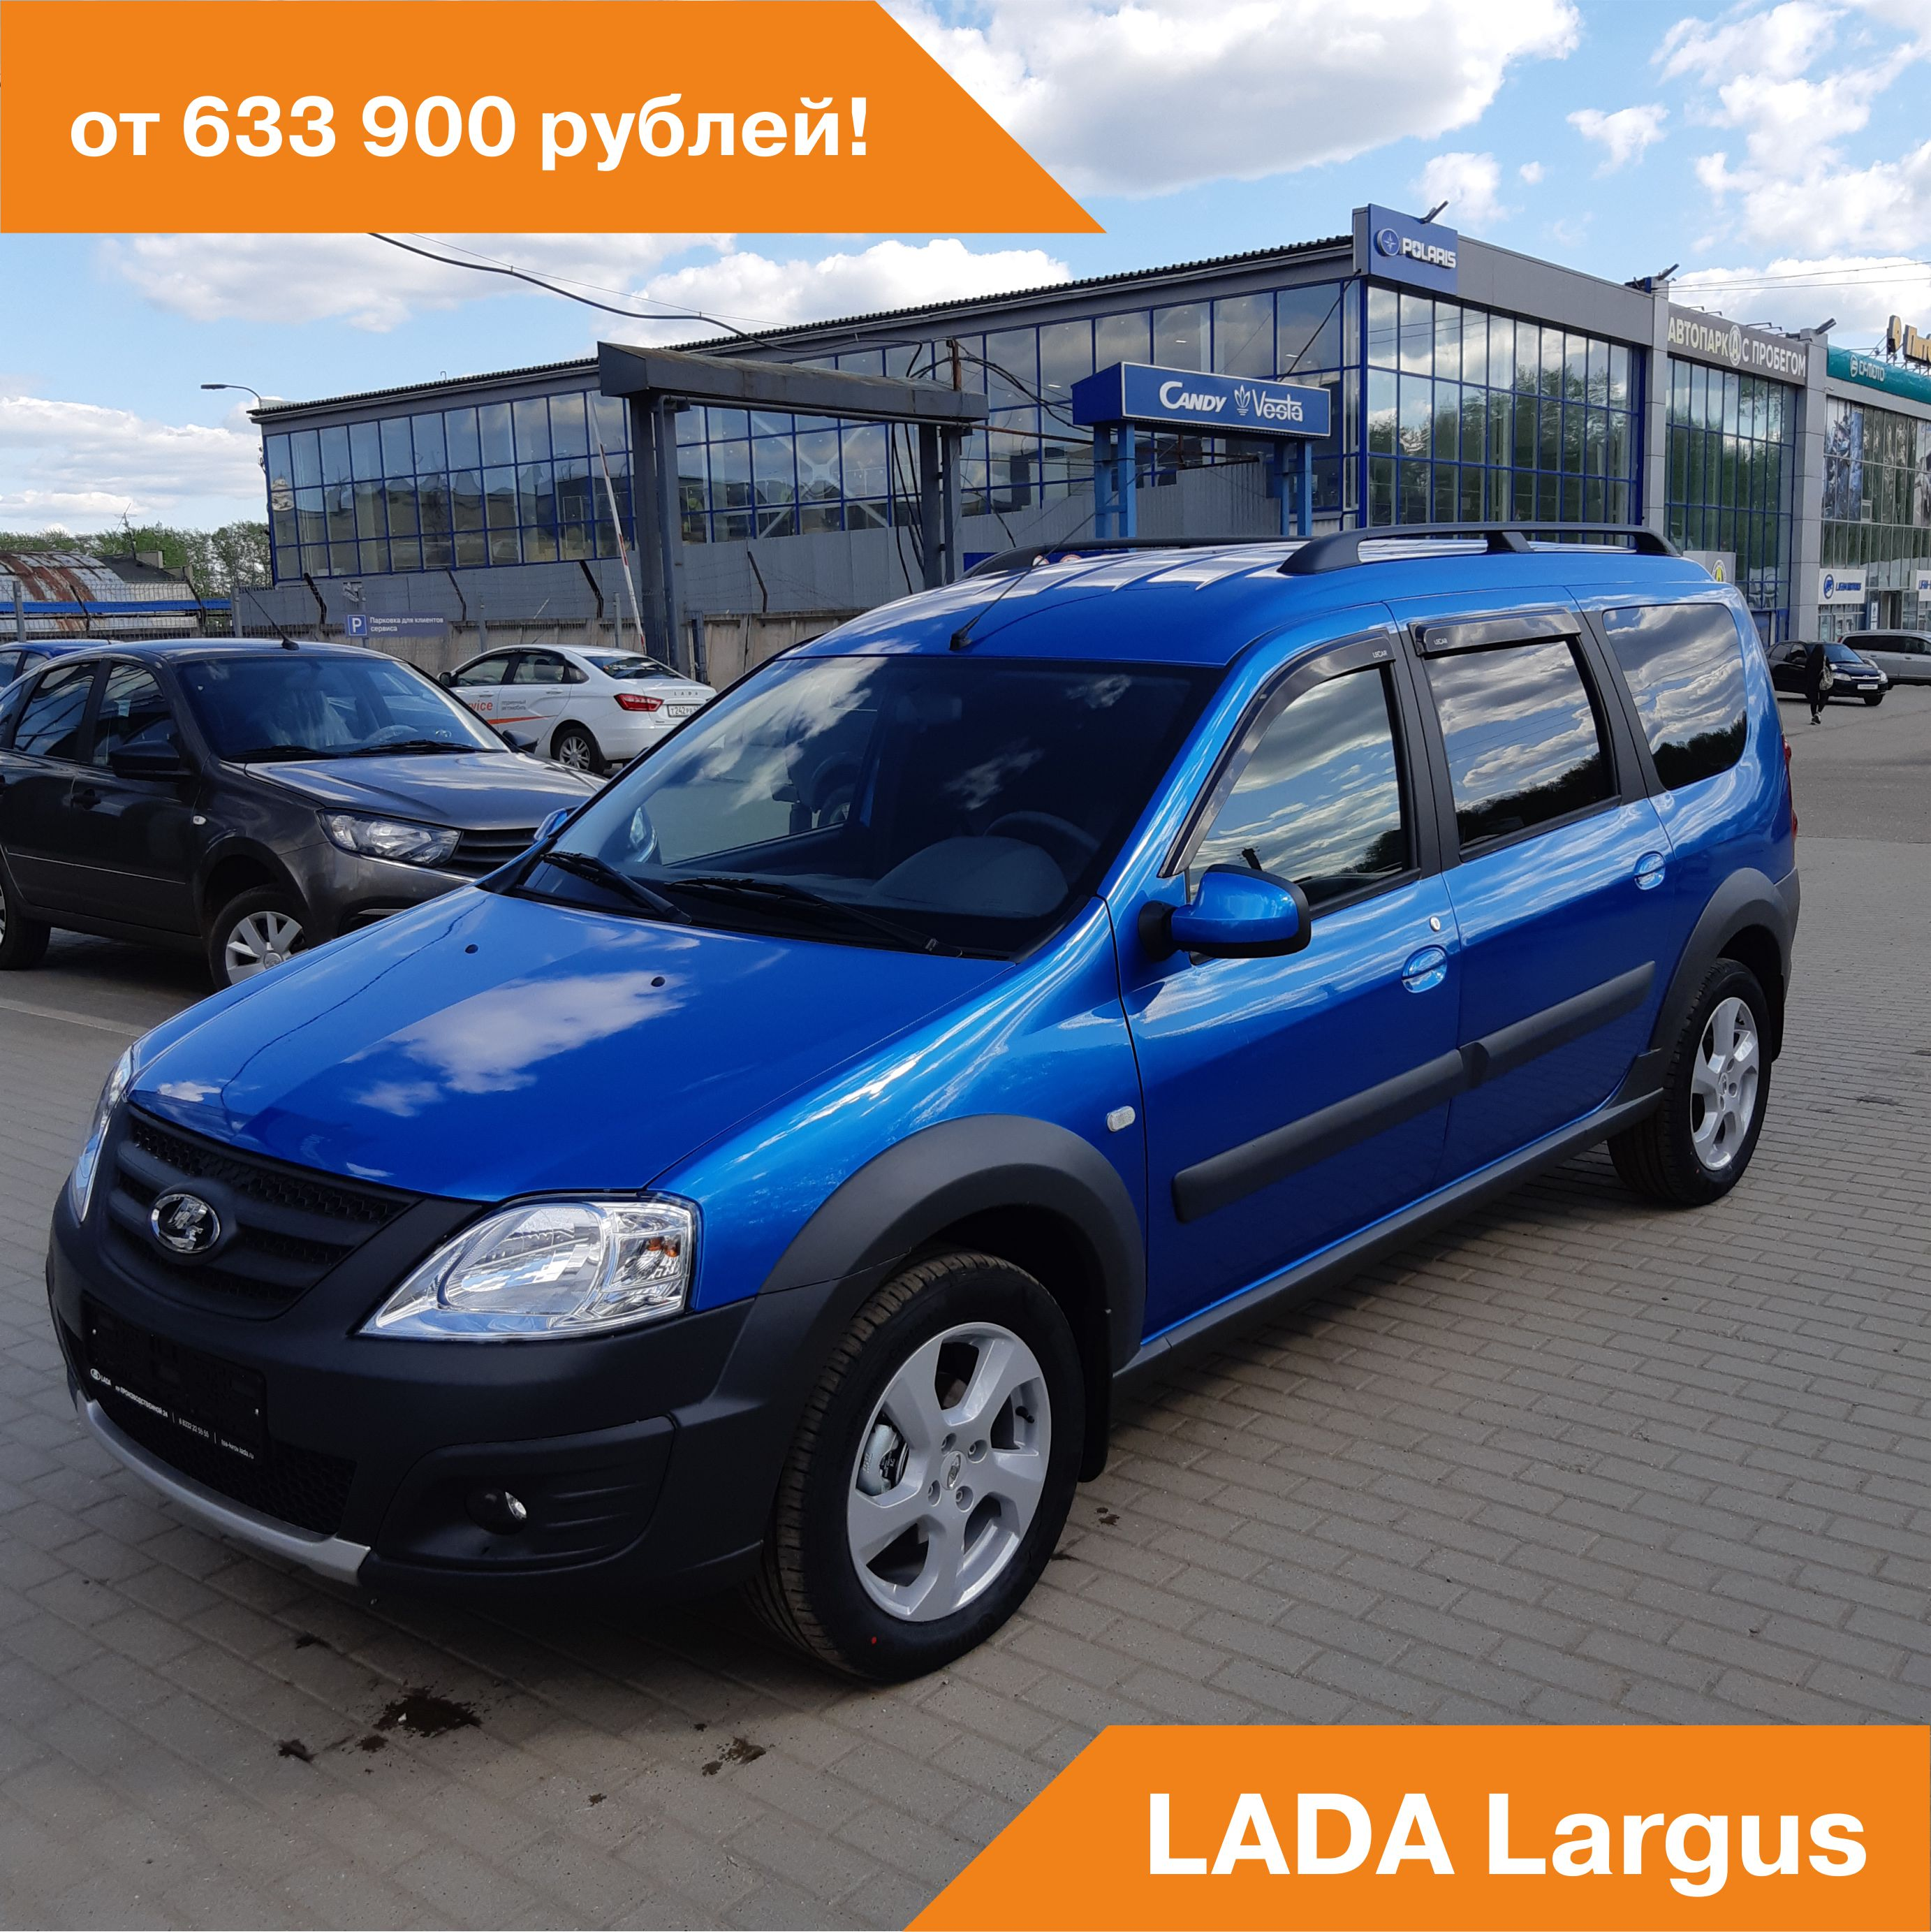 LADA Largus от 633 900 рублей!